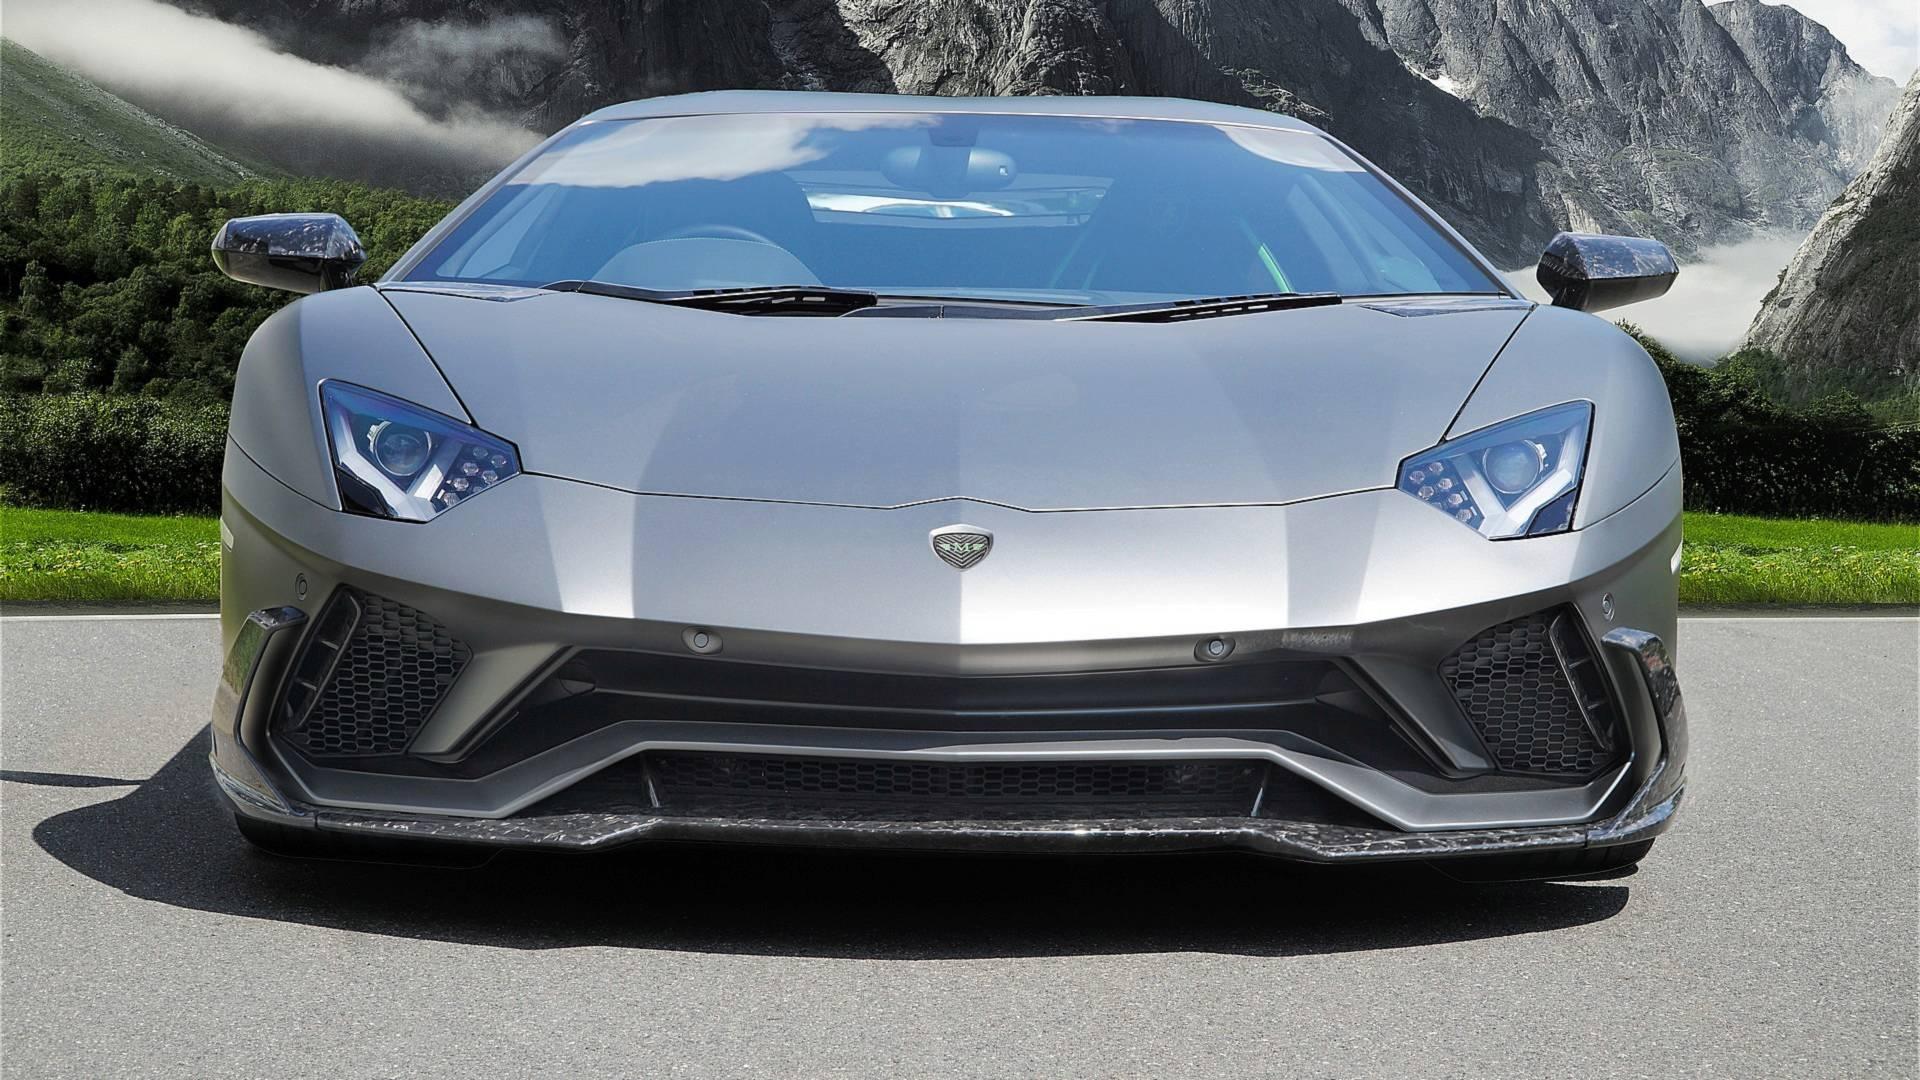 Lamborghini Aventador S by Mansory (1)